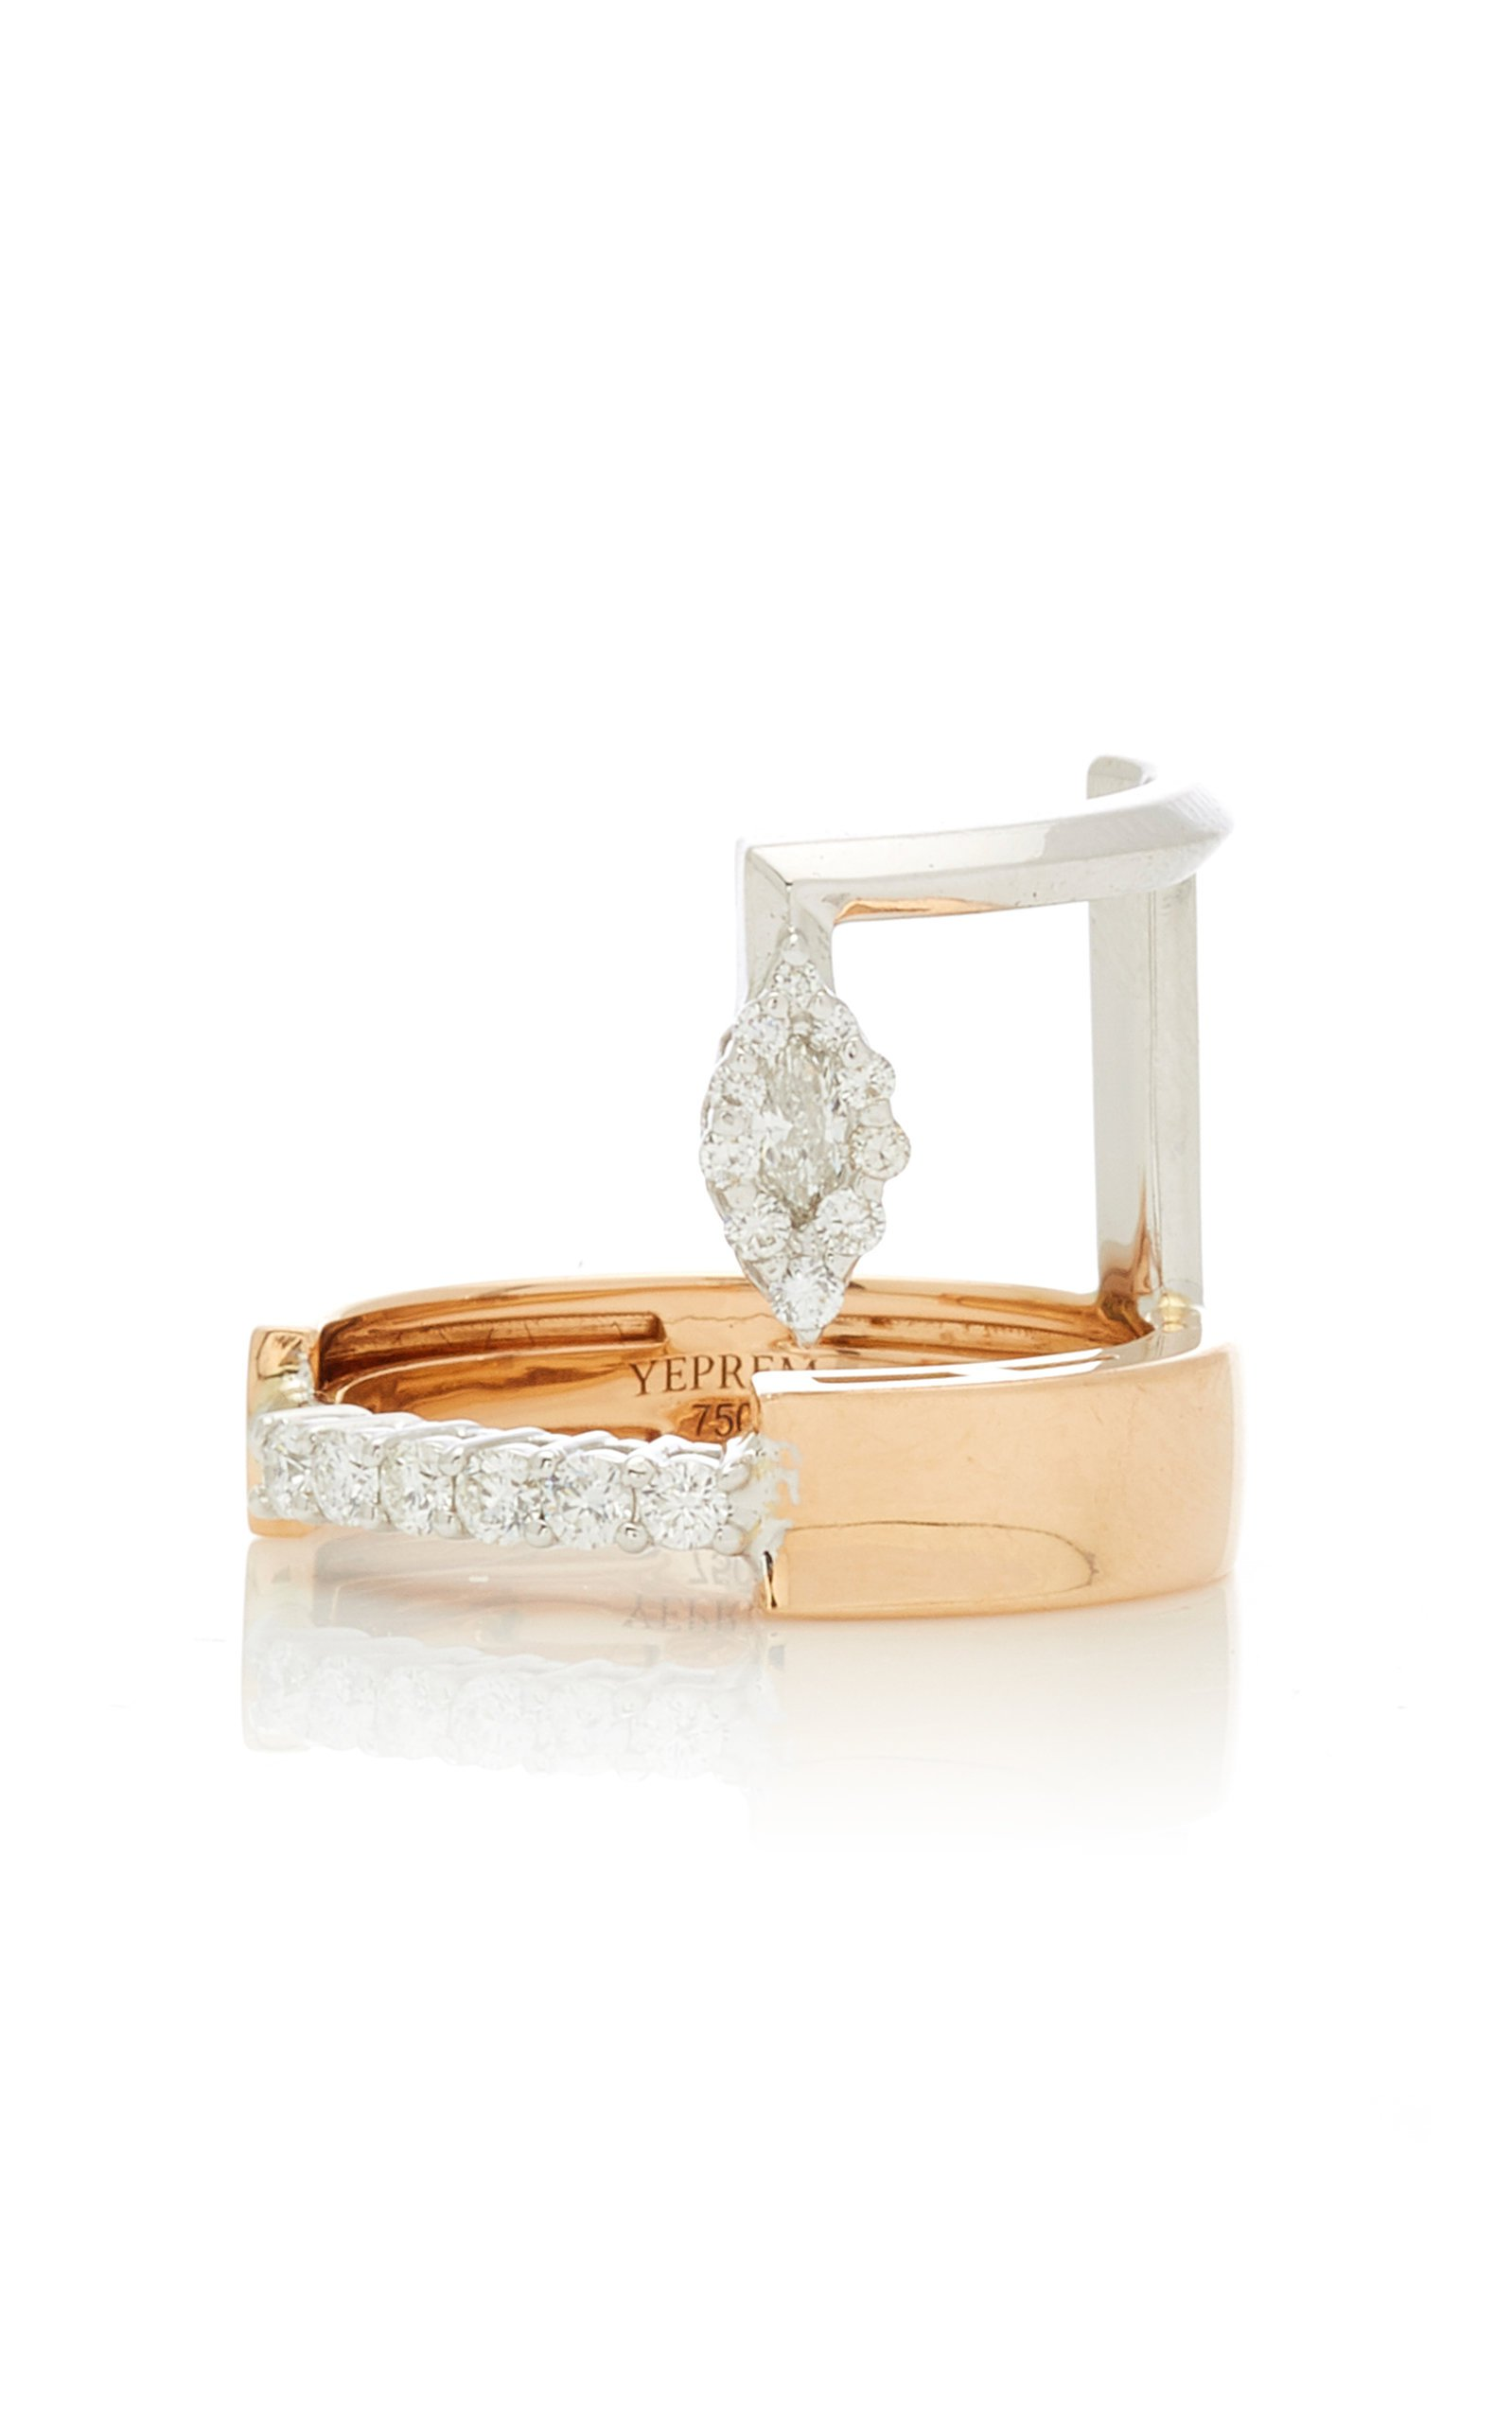 Yeprem 18K White & 18K Rose Gold Electrified Ring Size: 6.5